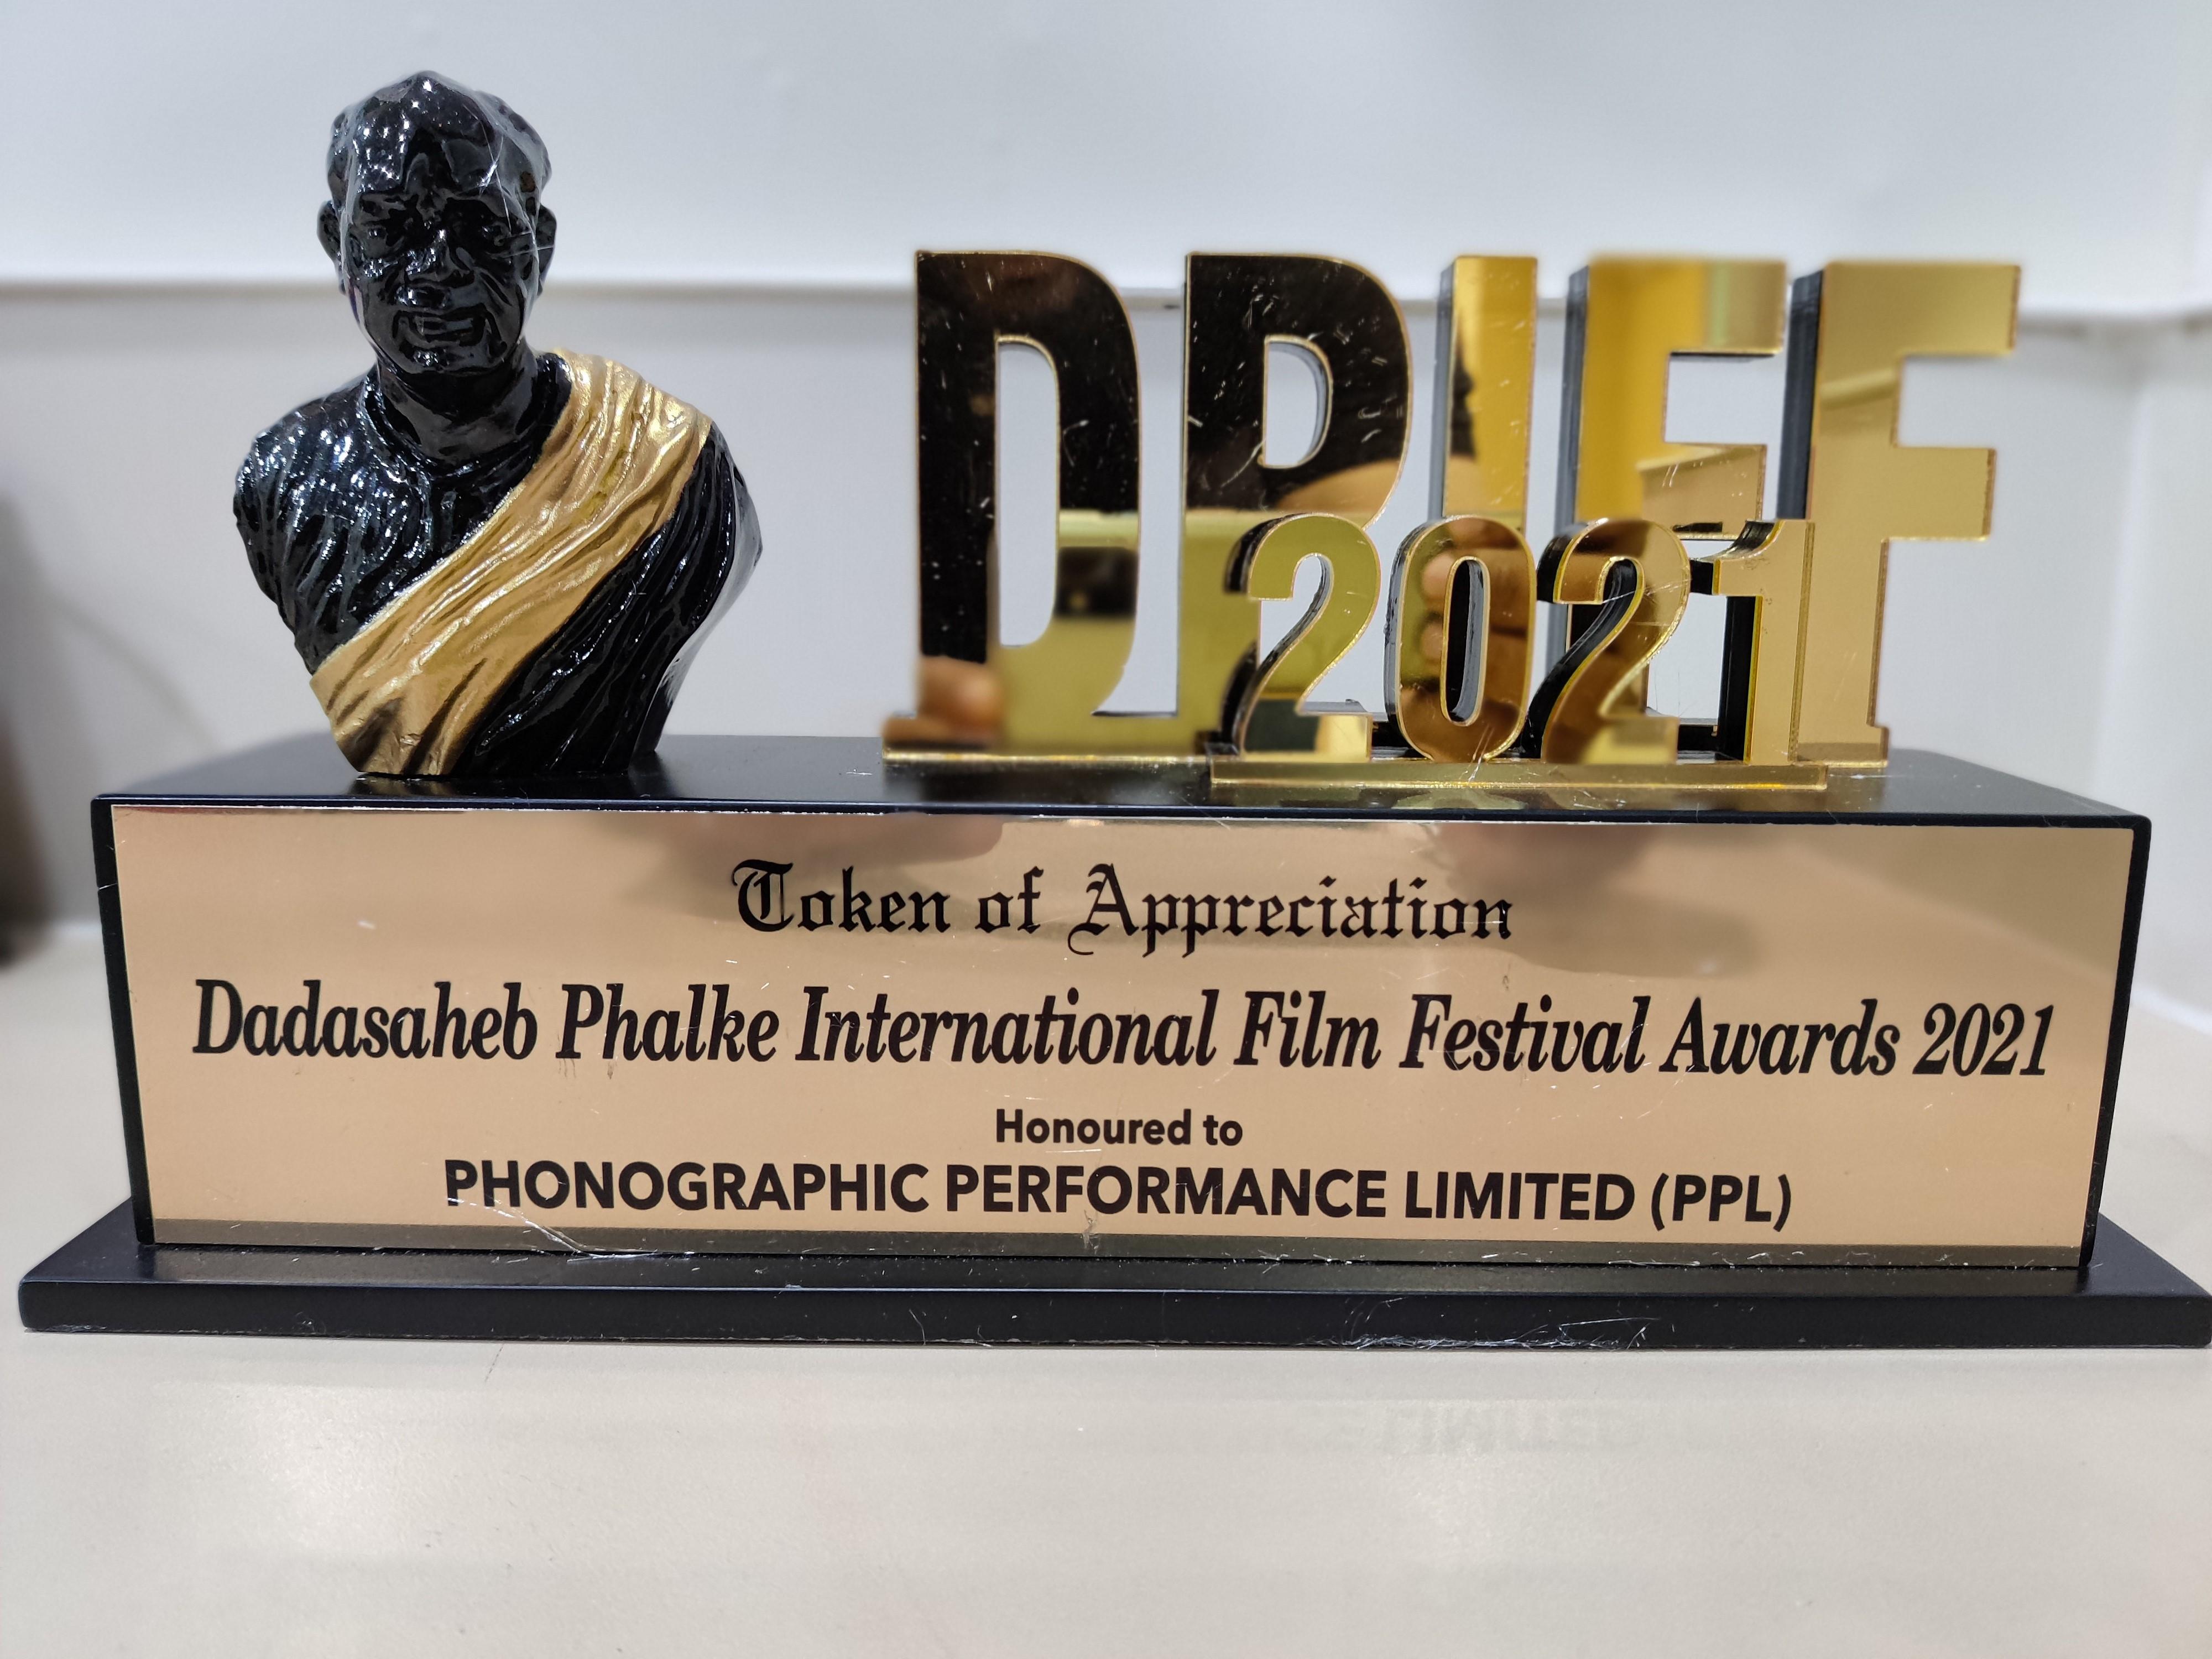 PPL India Honoured at the Dadasaheb Phalke International Film Festival Awards 2021